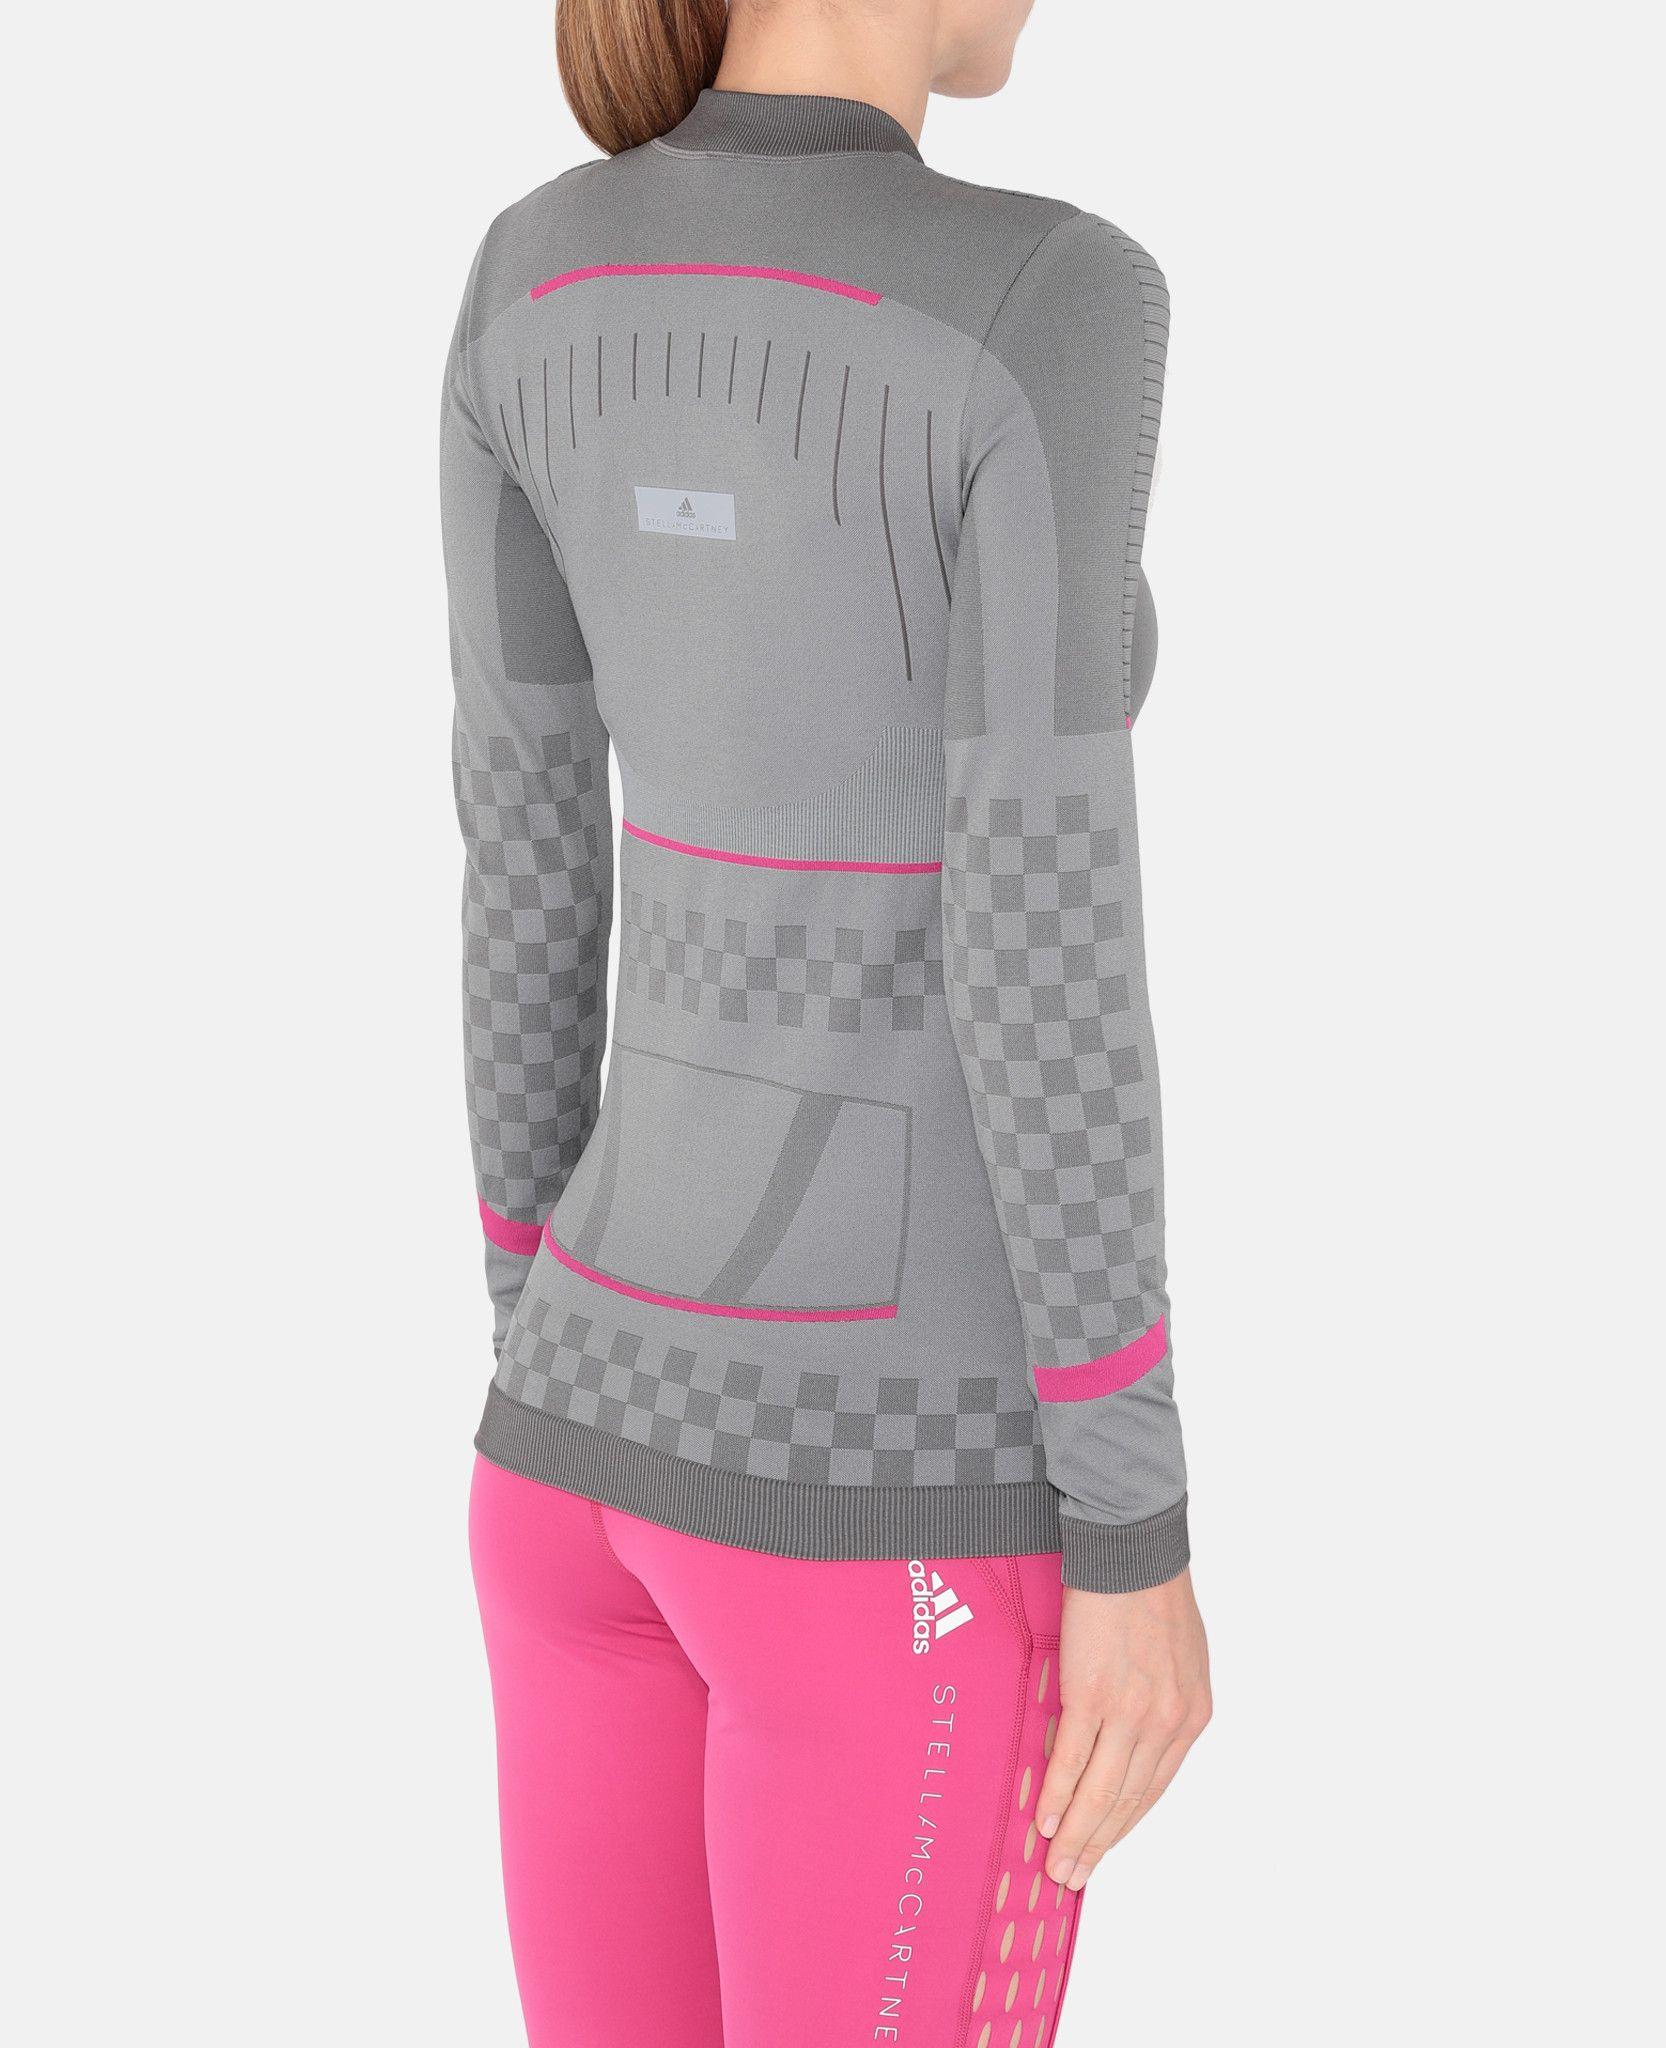 fd60f85e Gray Training Seamless Long Sleeve Shirt - ADIDAS by STELLA McCARTNEY